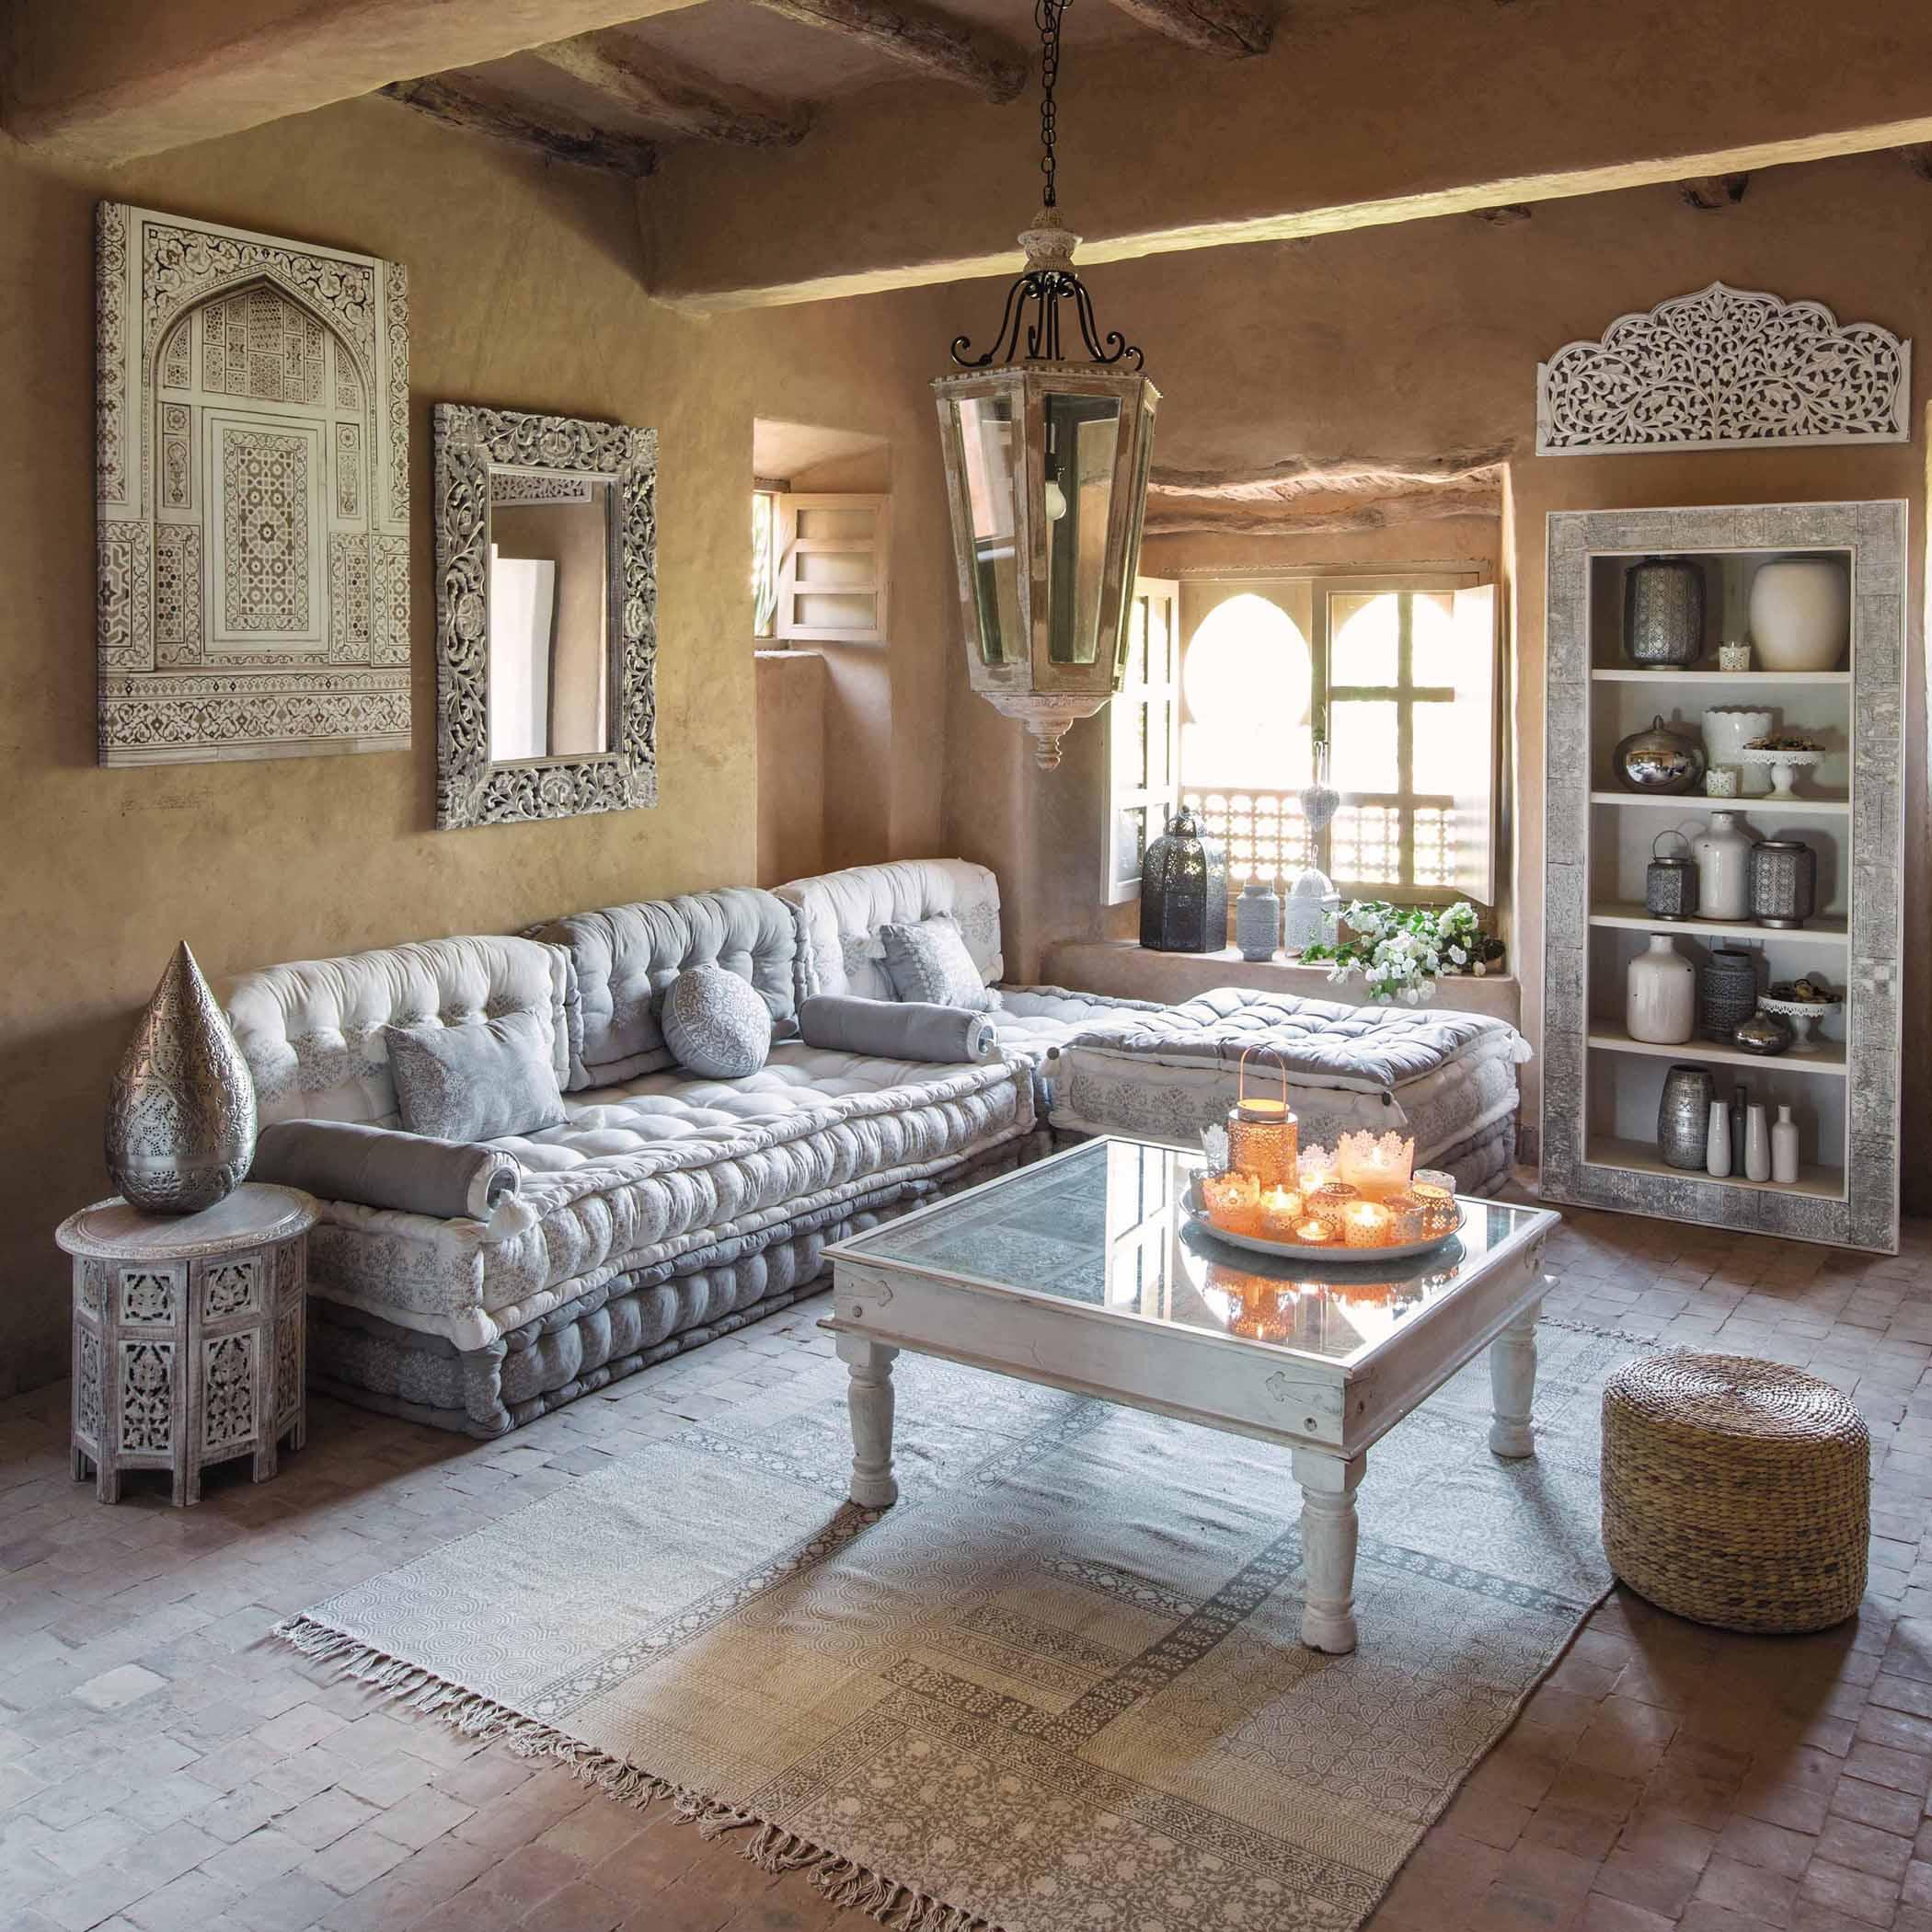 Orientalische Deko Bilder Ideen Couch